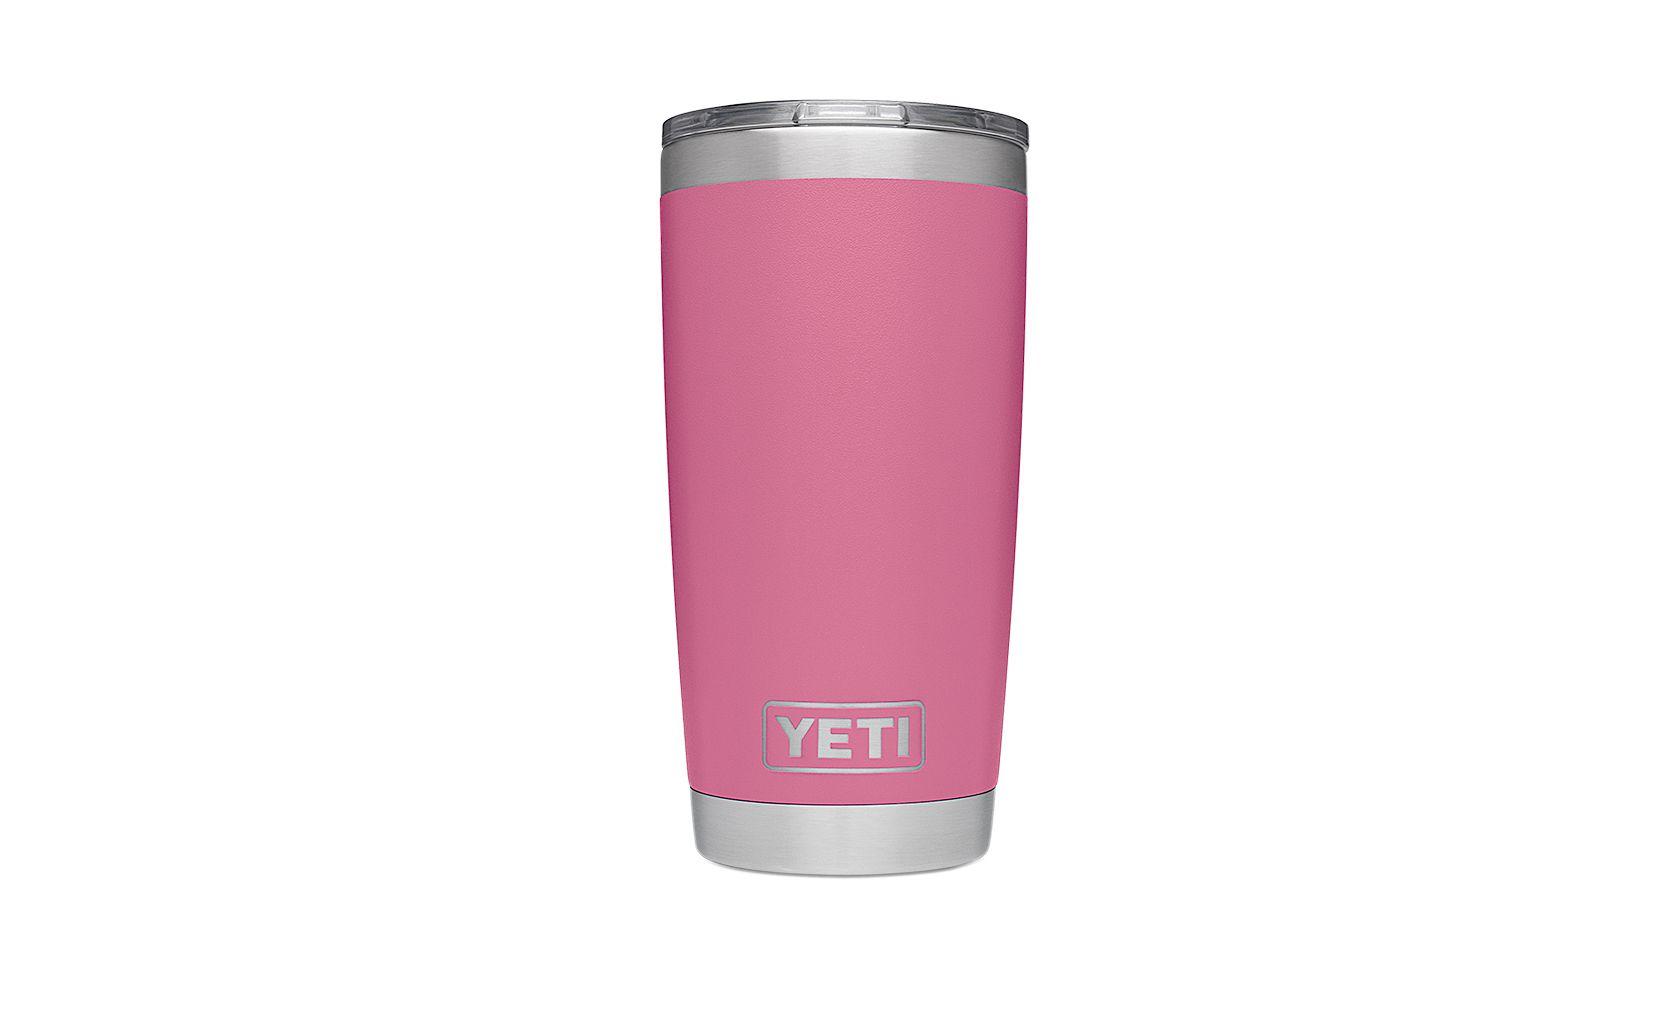 4e6f1d39224 YETI Rambler 20 oz Tumbler | Harbor Pink | Fashion accessories ...